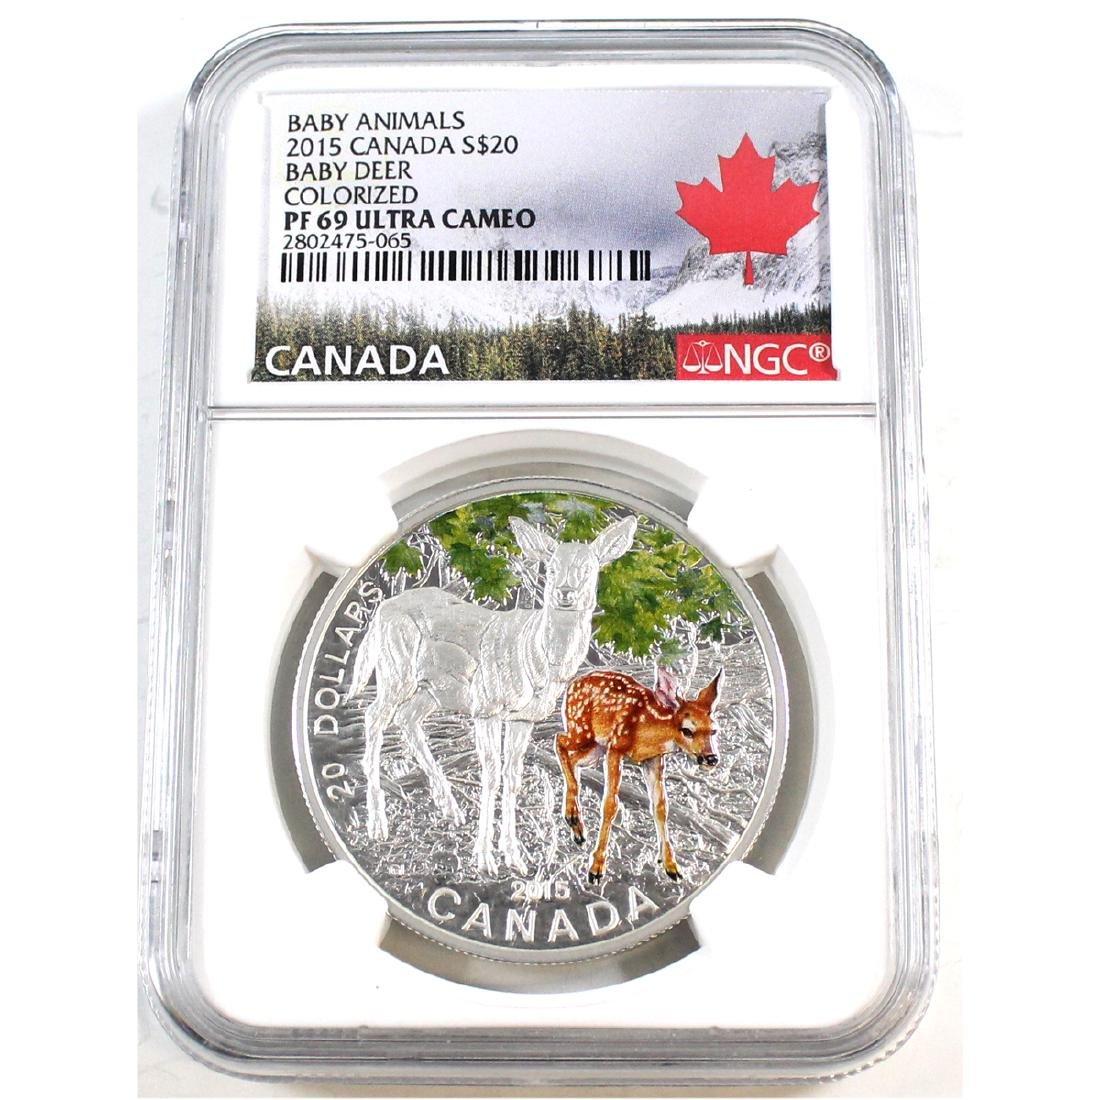 2014 Canada $20 Baby Animals - Baby Deer Fine Silver